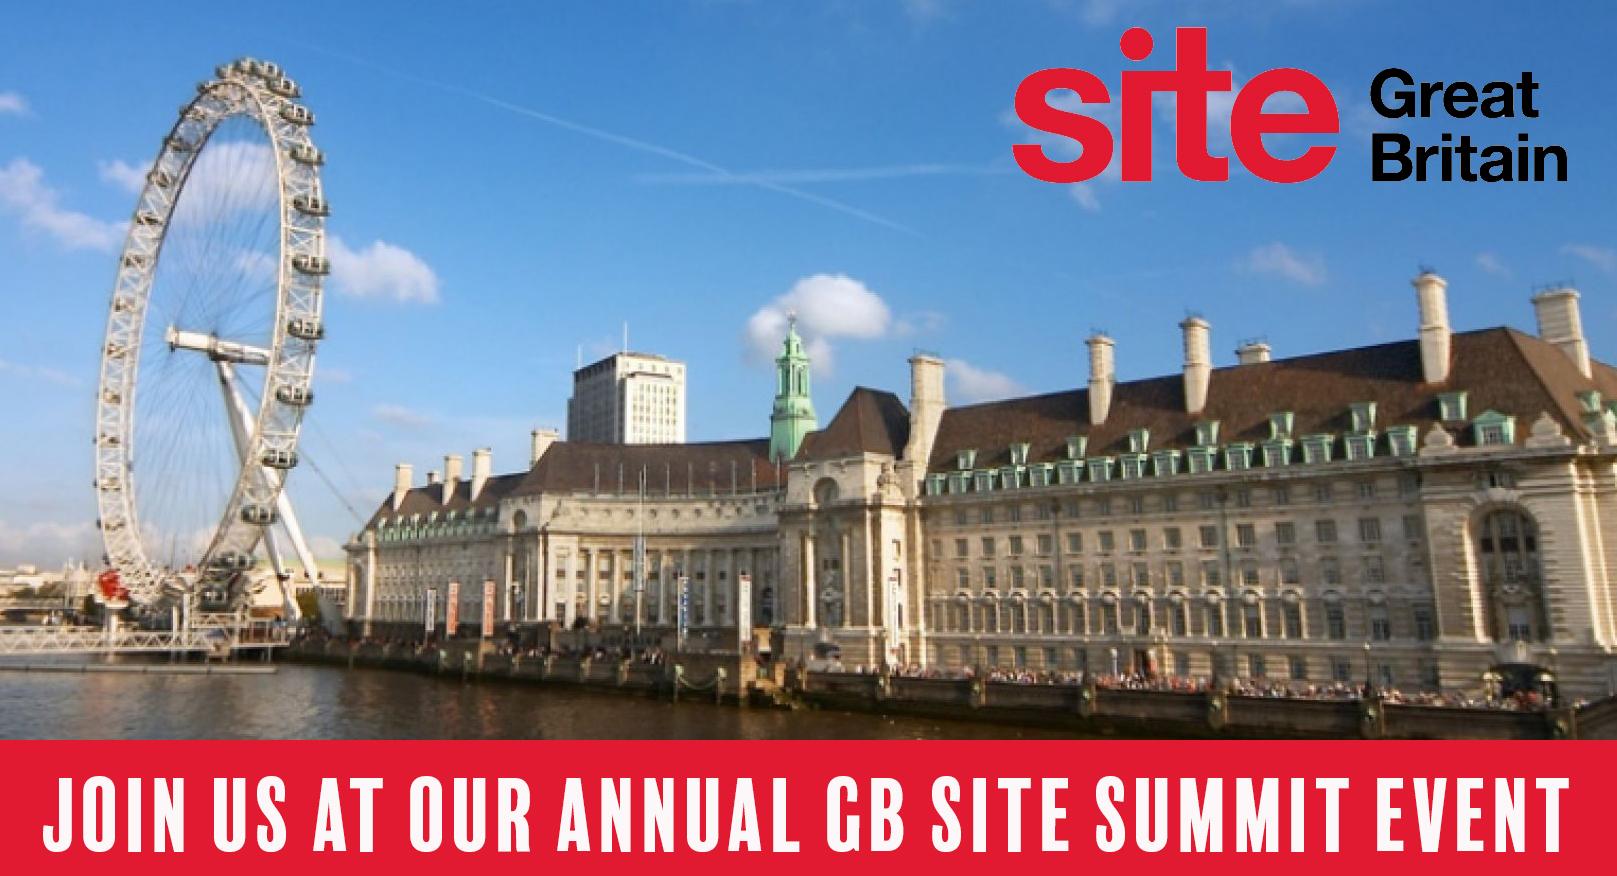 SITE GB Summit